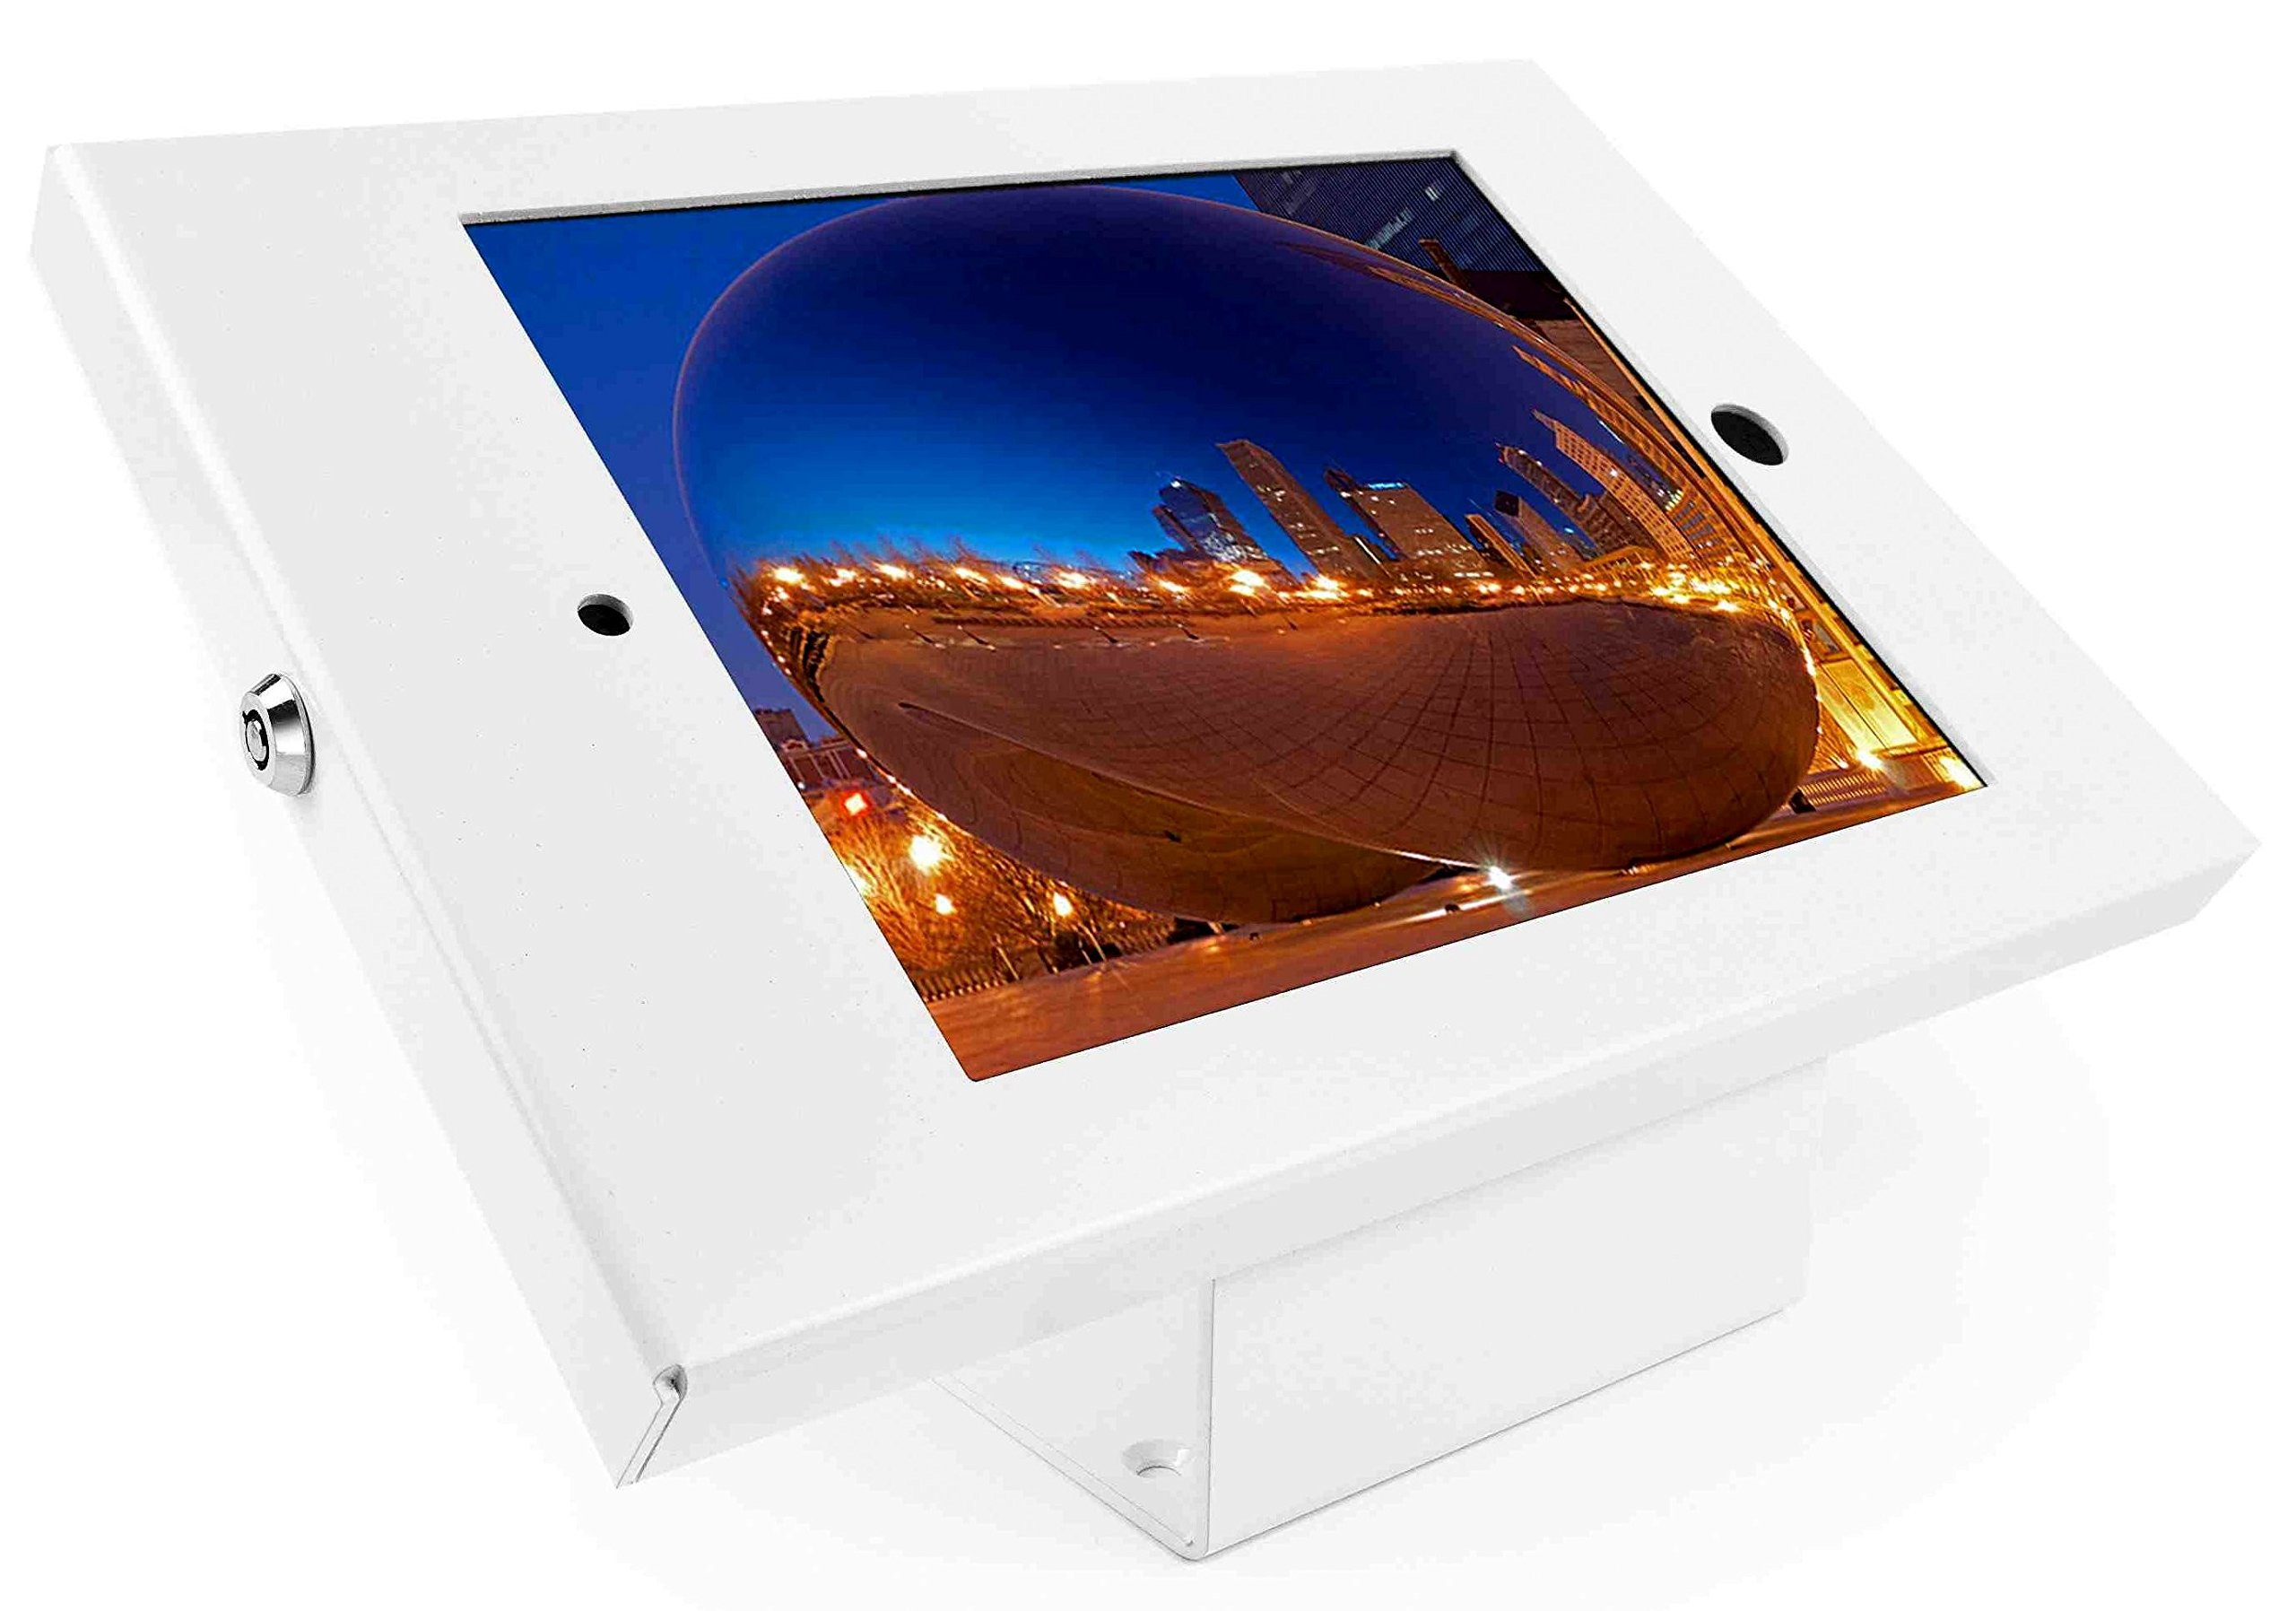 Maclocks 101W202ENW Full Metal Jacket Kiosk with 45-Degree Mount for iPad 2/3/4, iPad Air, iPad Air 2 (White)